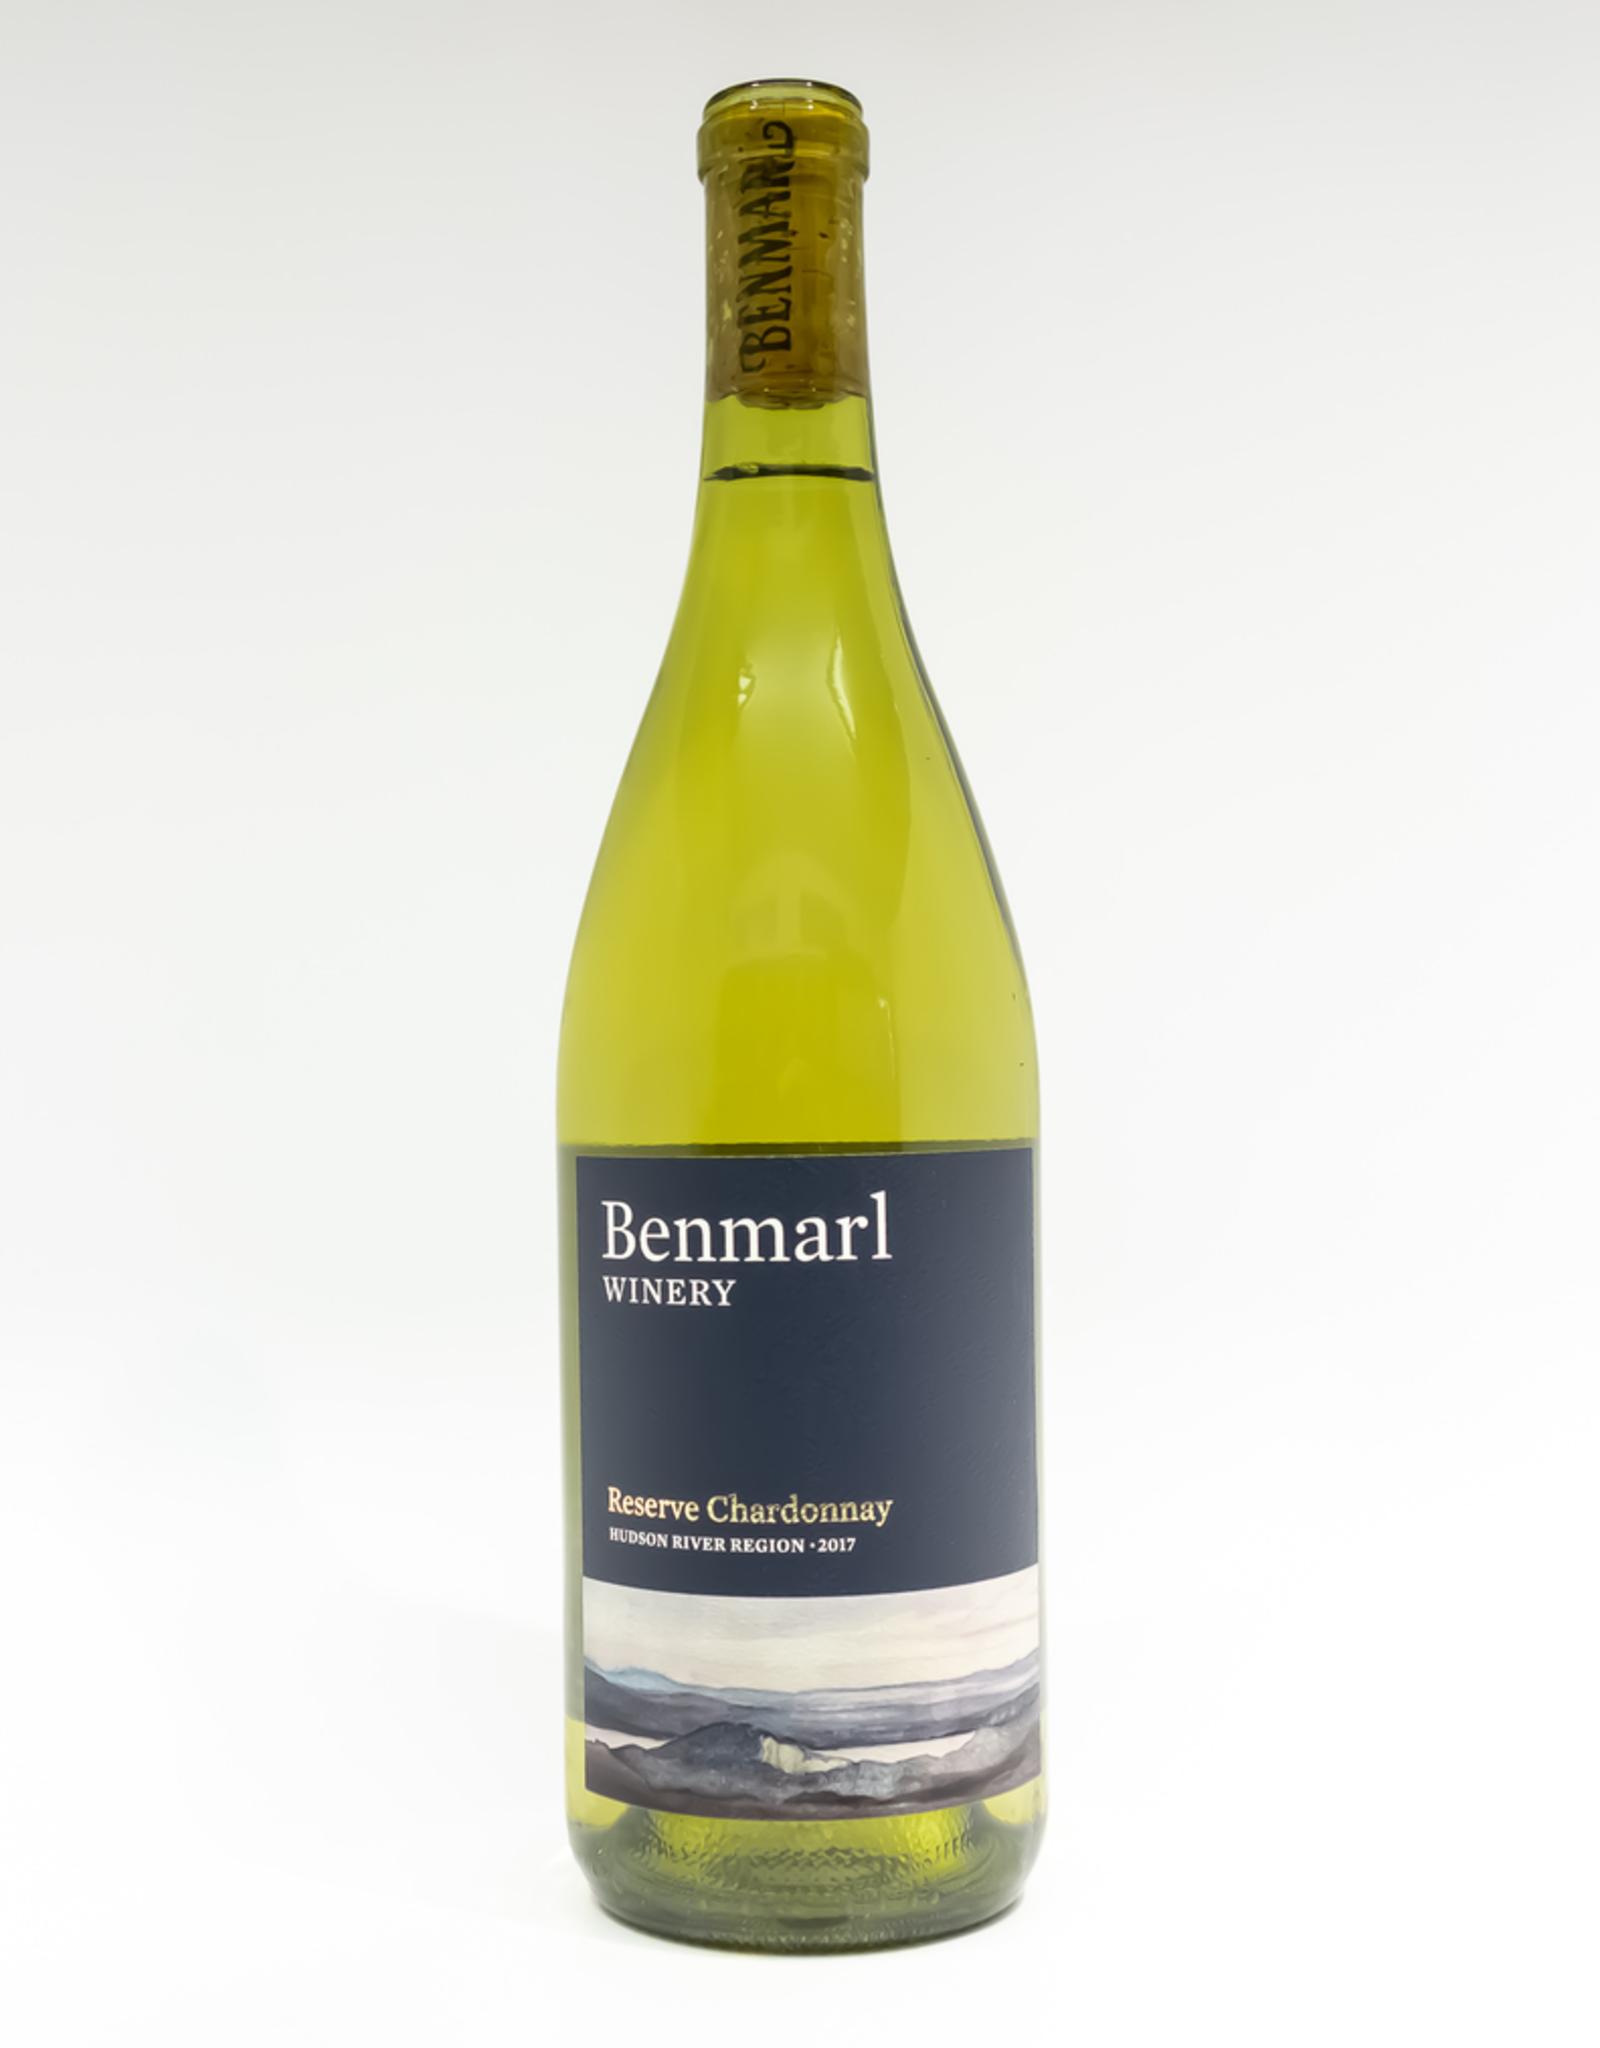 Wine-White-Round Benmarl Winery Reserve Chardonnay Hudson River Region 2017